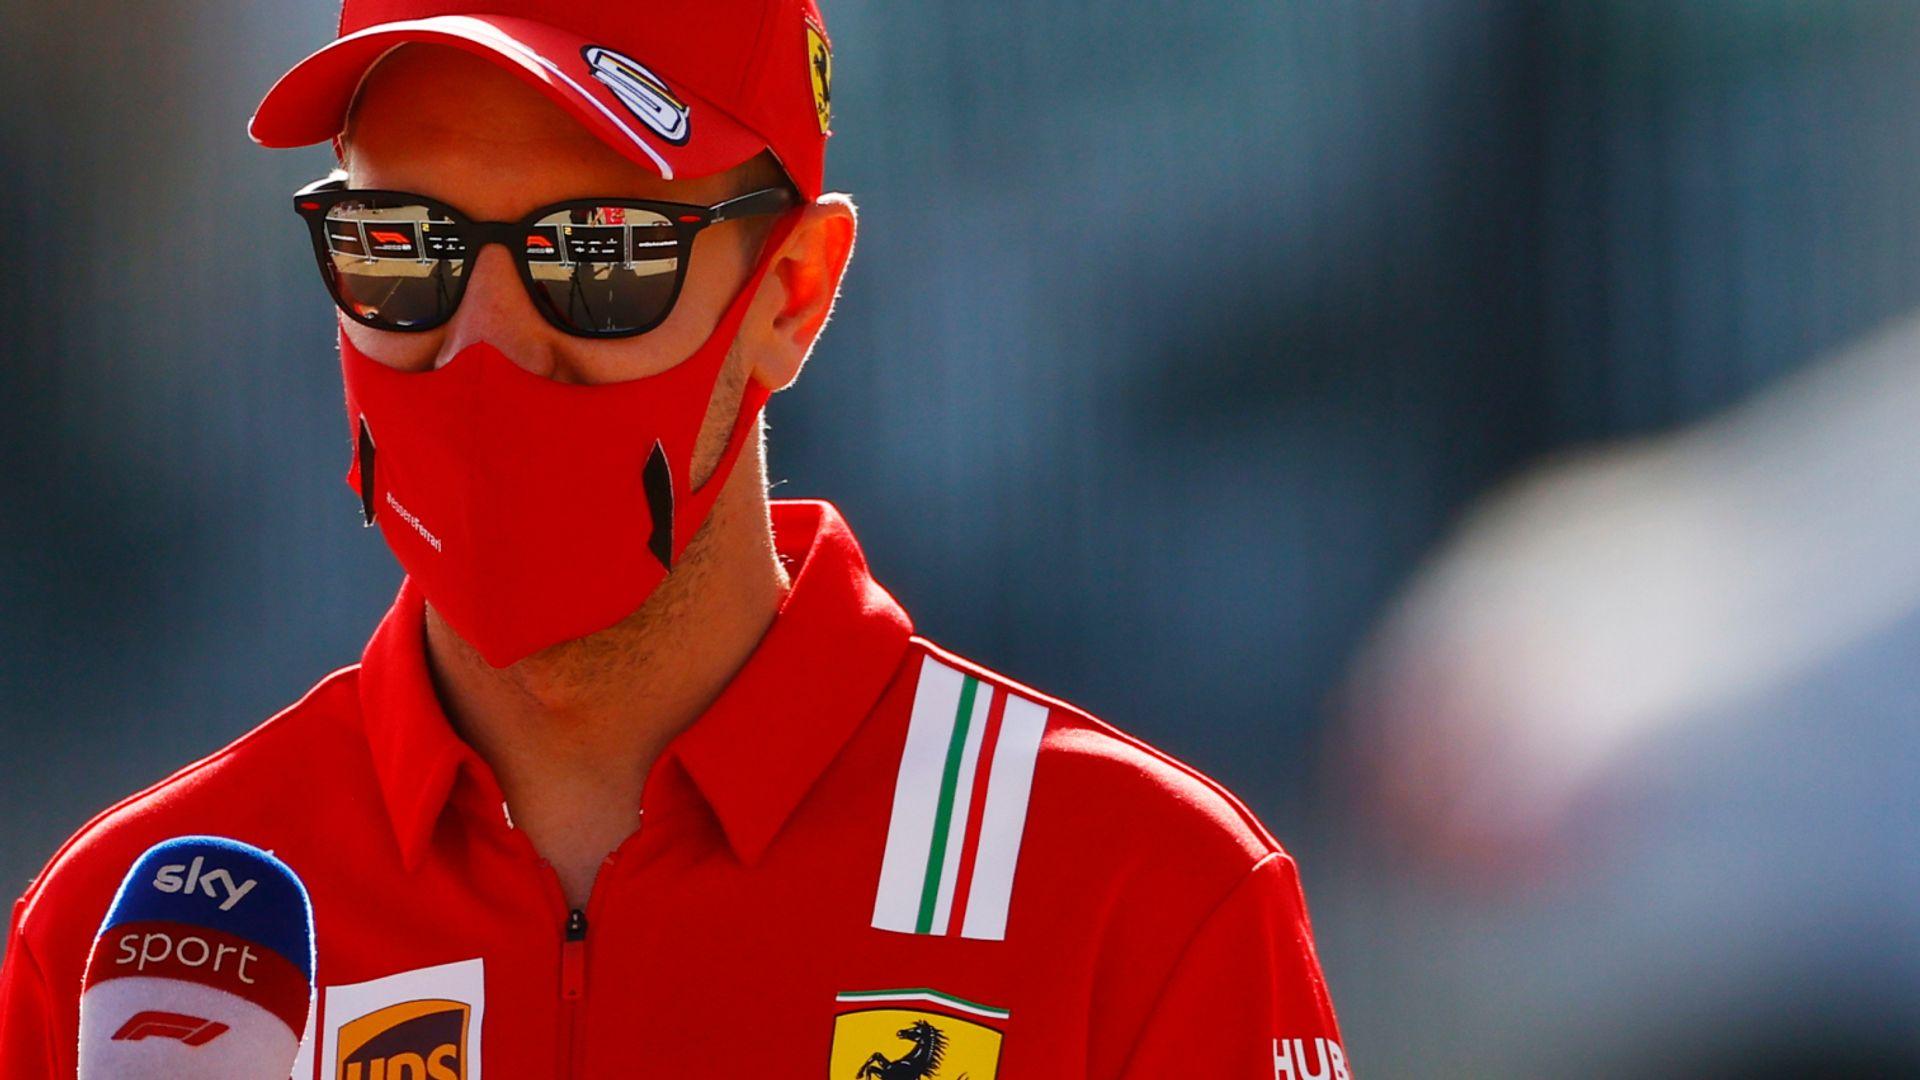 Vettel staying calm despite 'awkward' F1 struggle